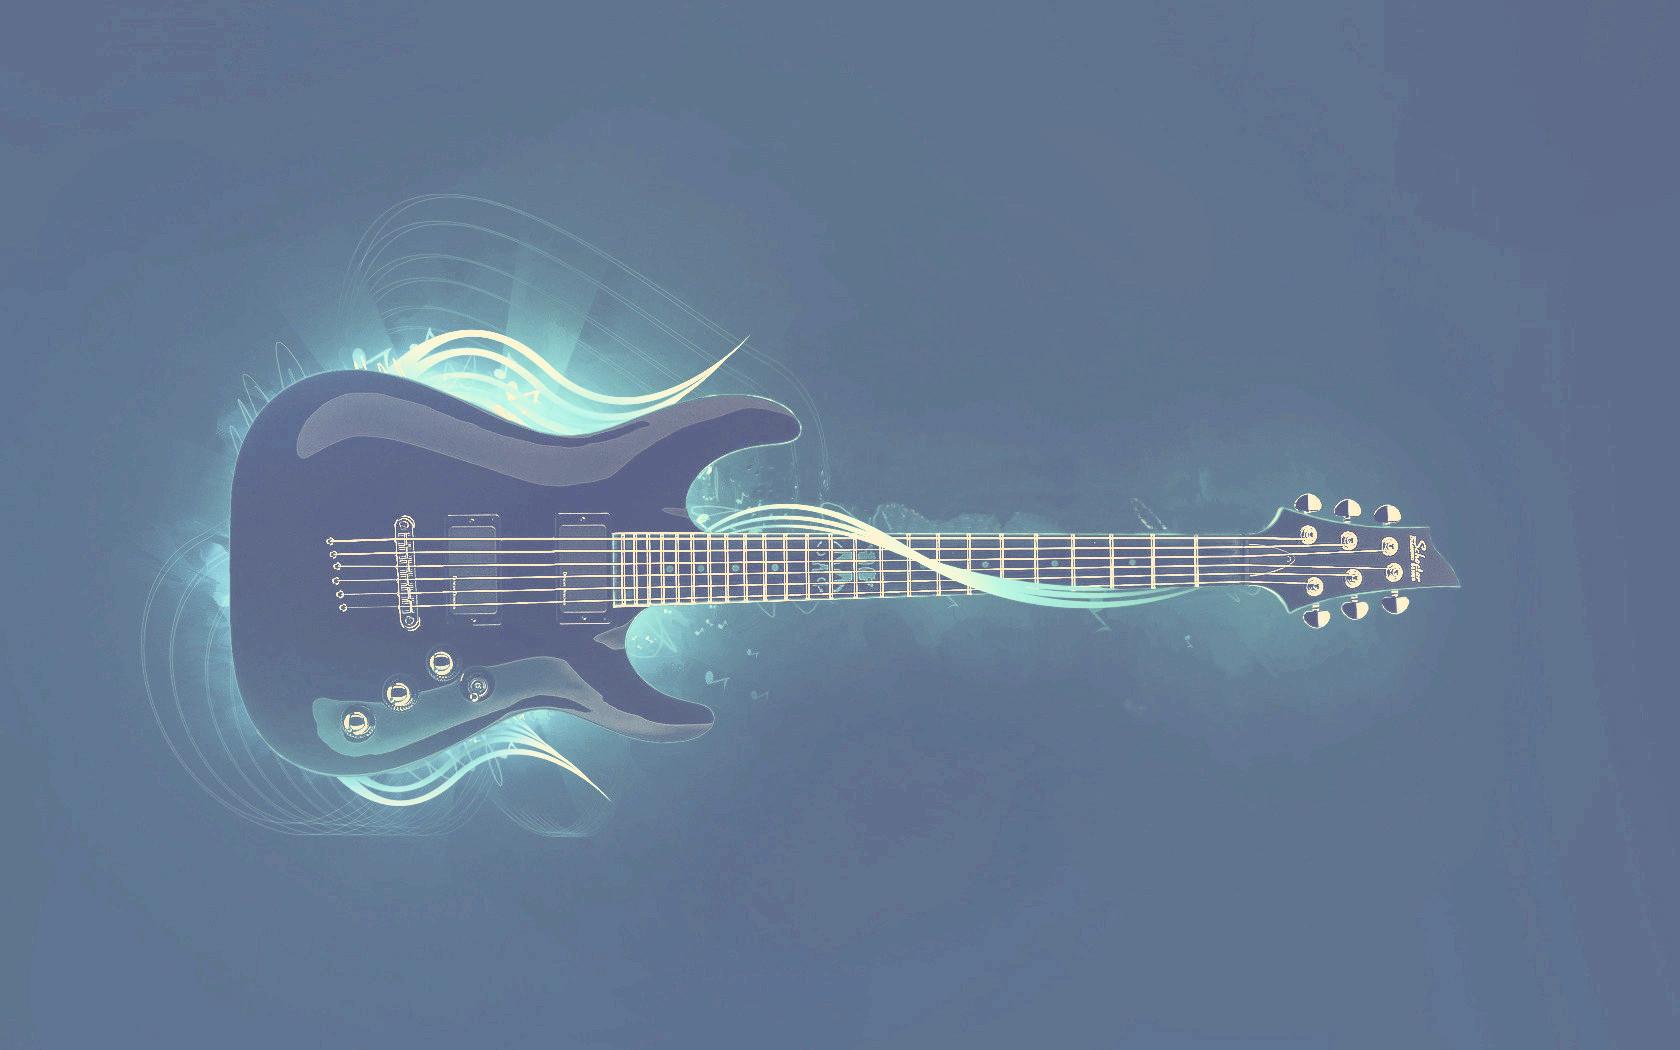 Rock Schecter Electric Guitar - Squire Strat Guitar Tremolo , HD Wallpaper & Backgrounds